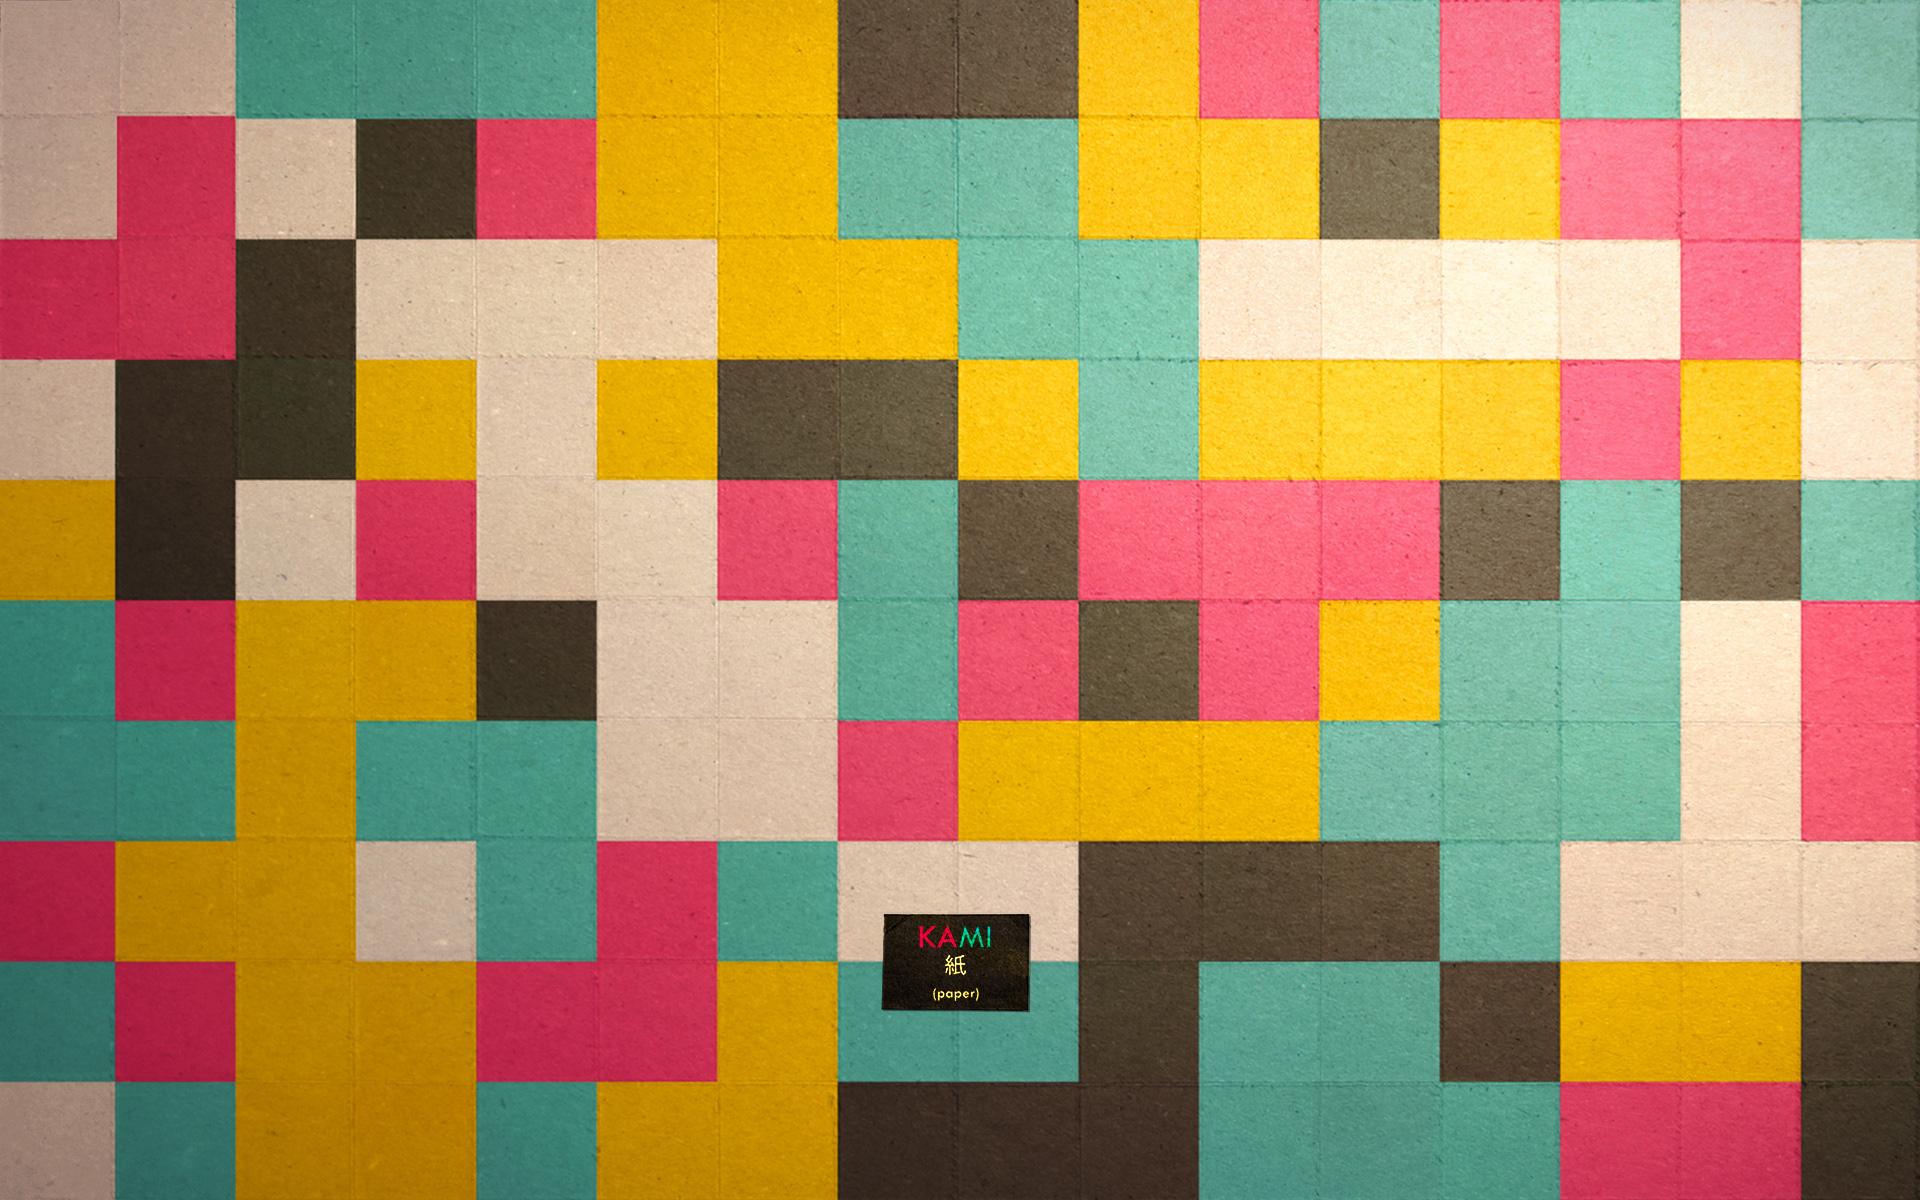 Free Kami Wallpaper in 1920x1200